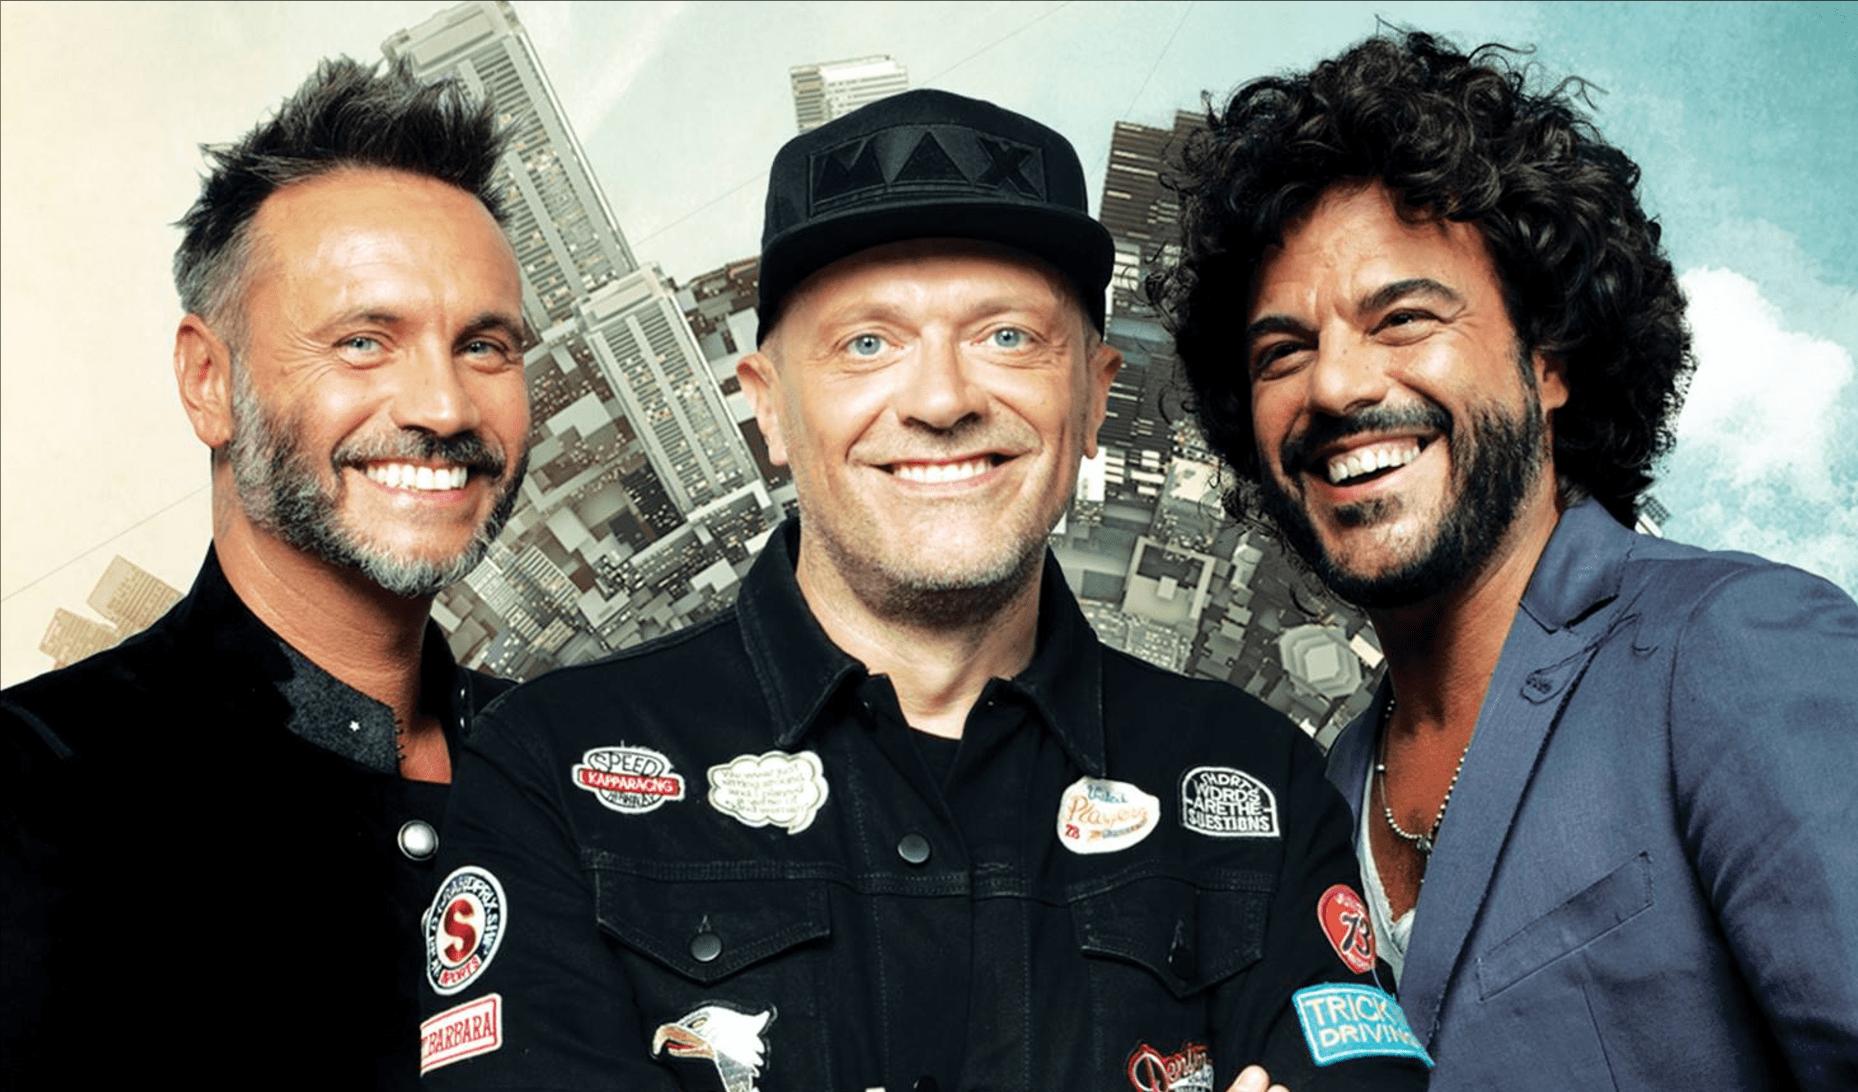 Max Pezzali, Nek e Francesco Renga, 'Duri da battere': un tour insieme